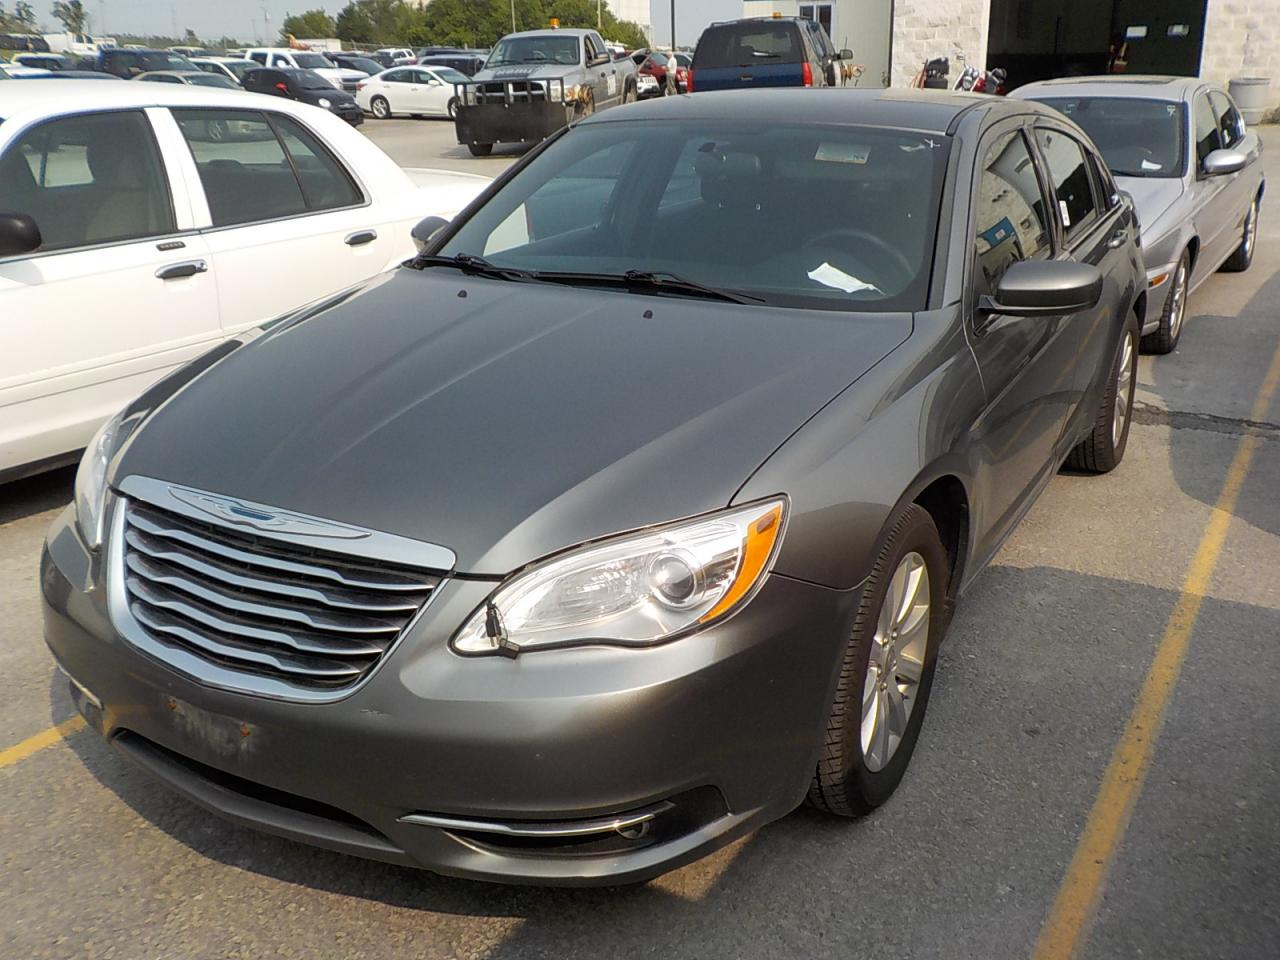 Photo of Grey 2012 Chrysler 200